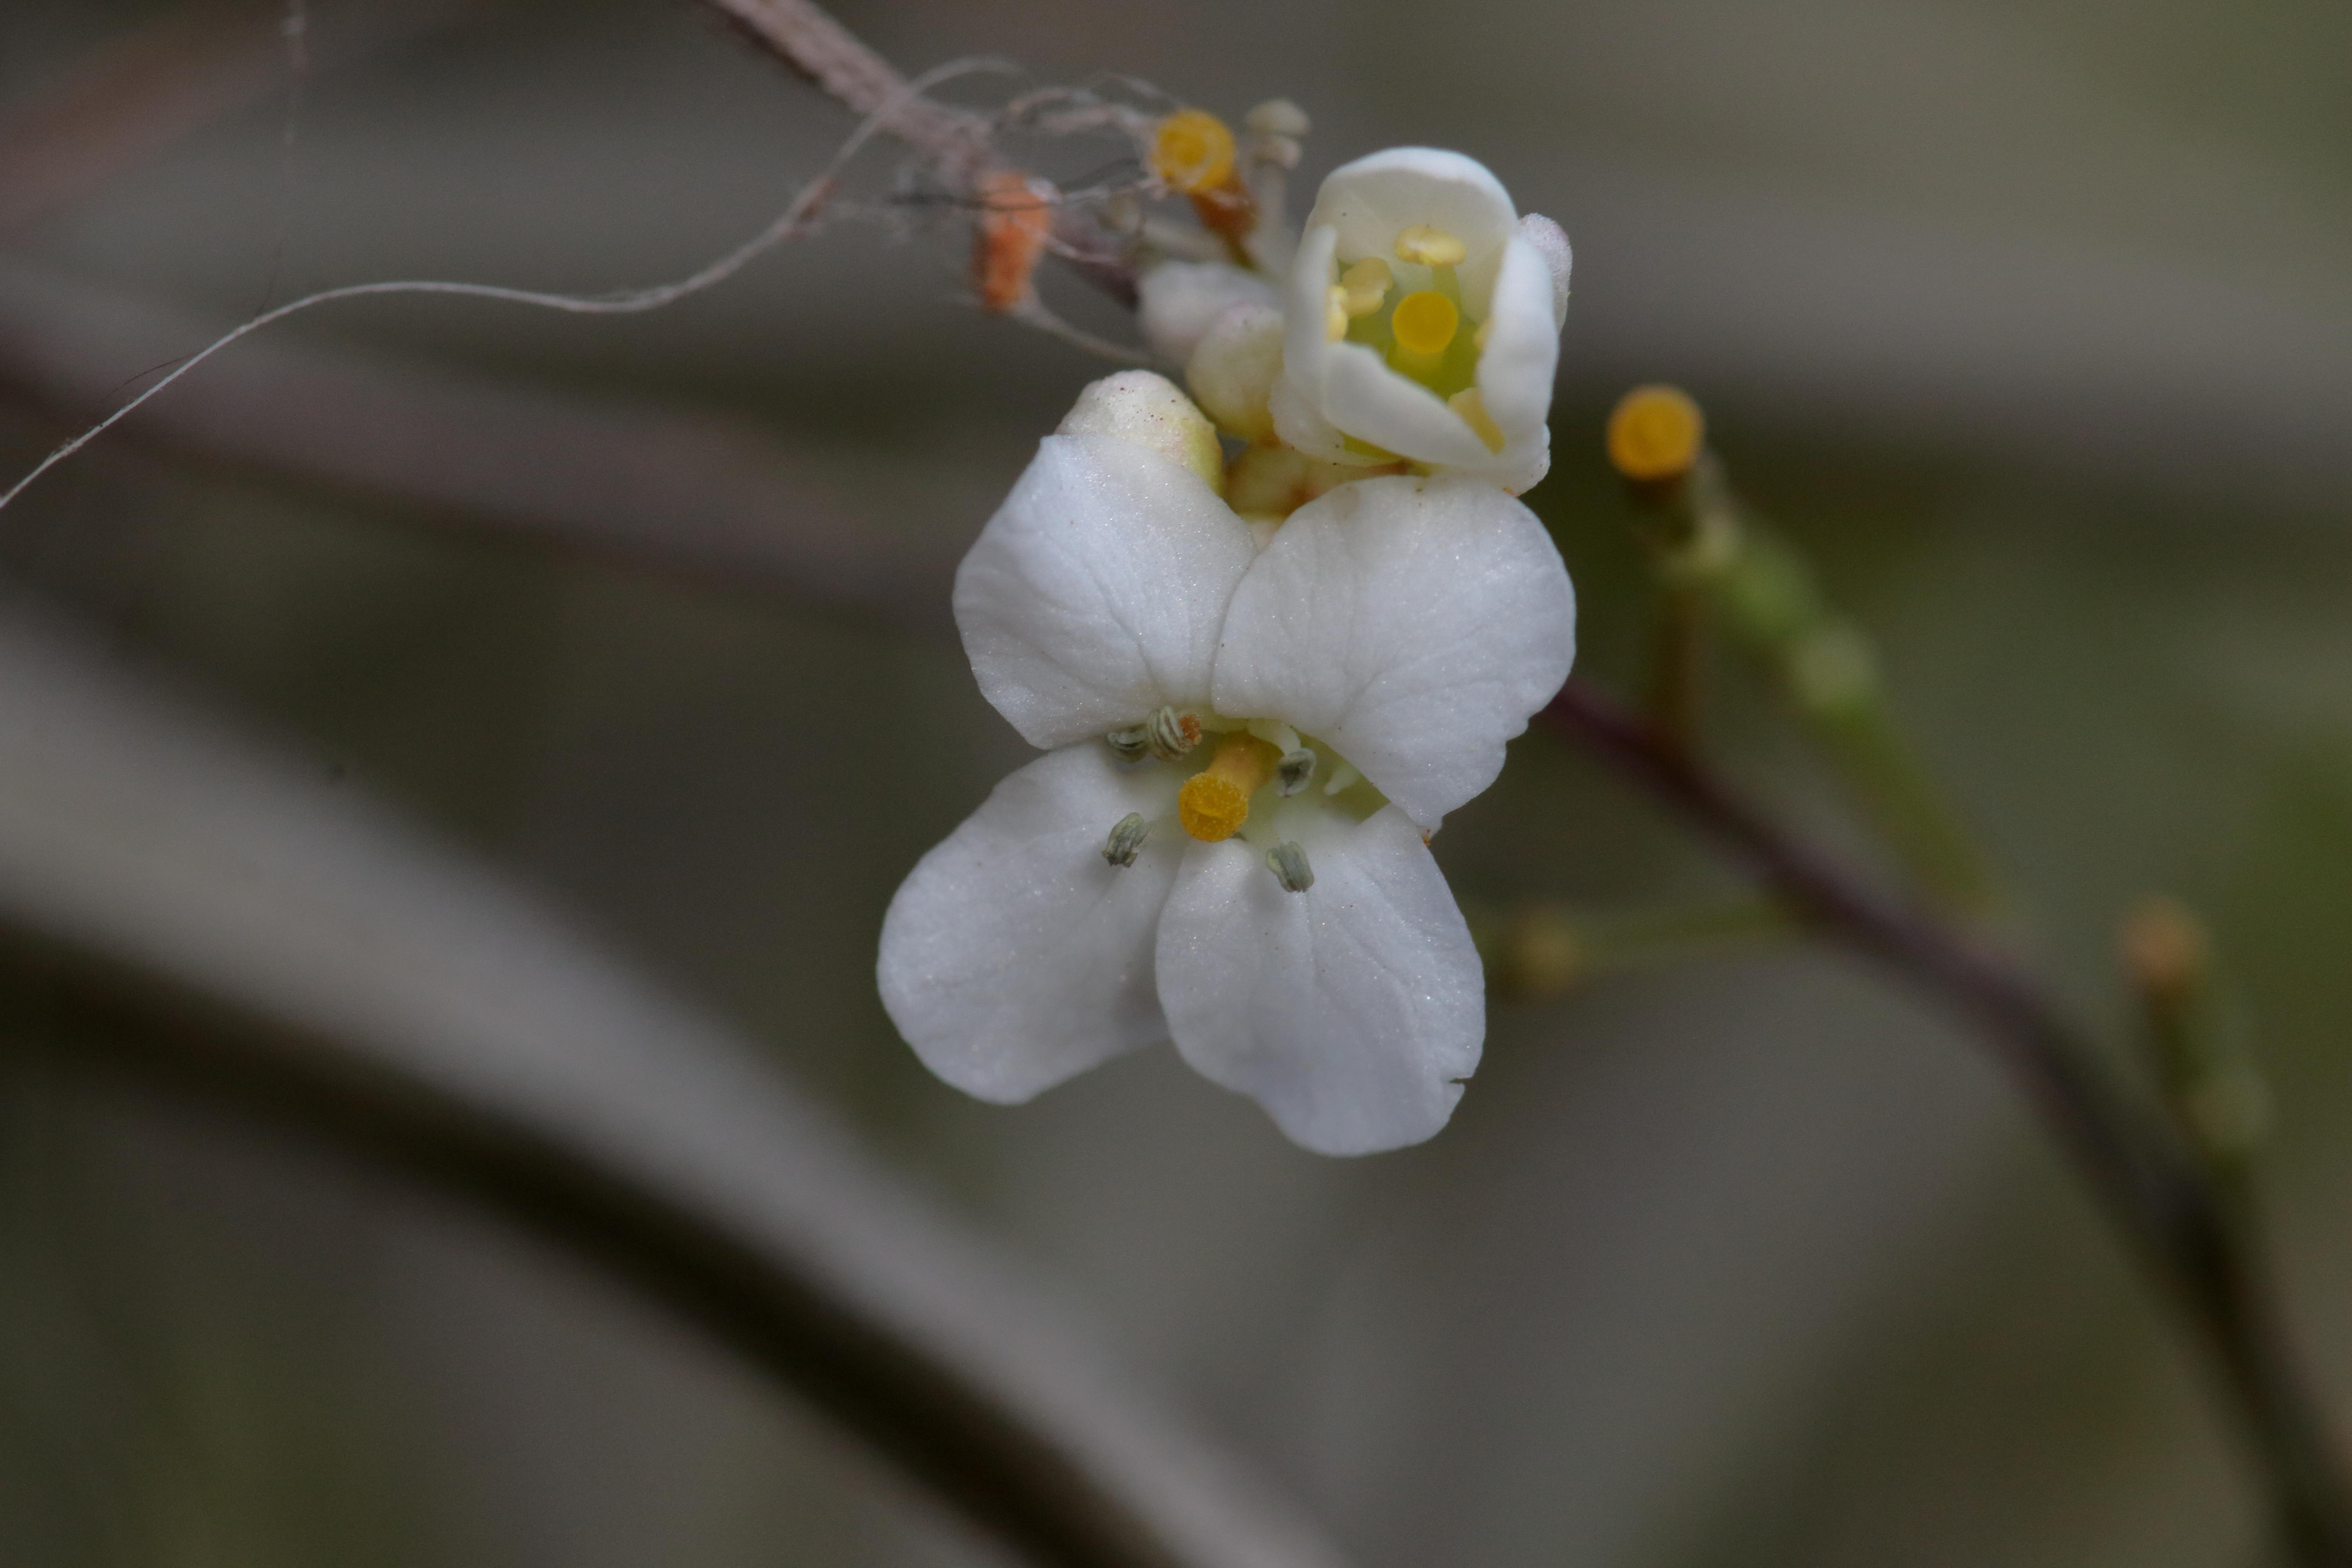 img_7911-crambe-strigosa-flor.jpg